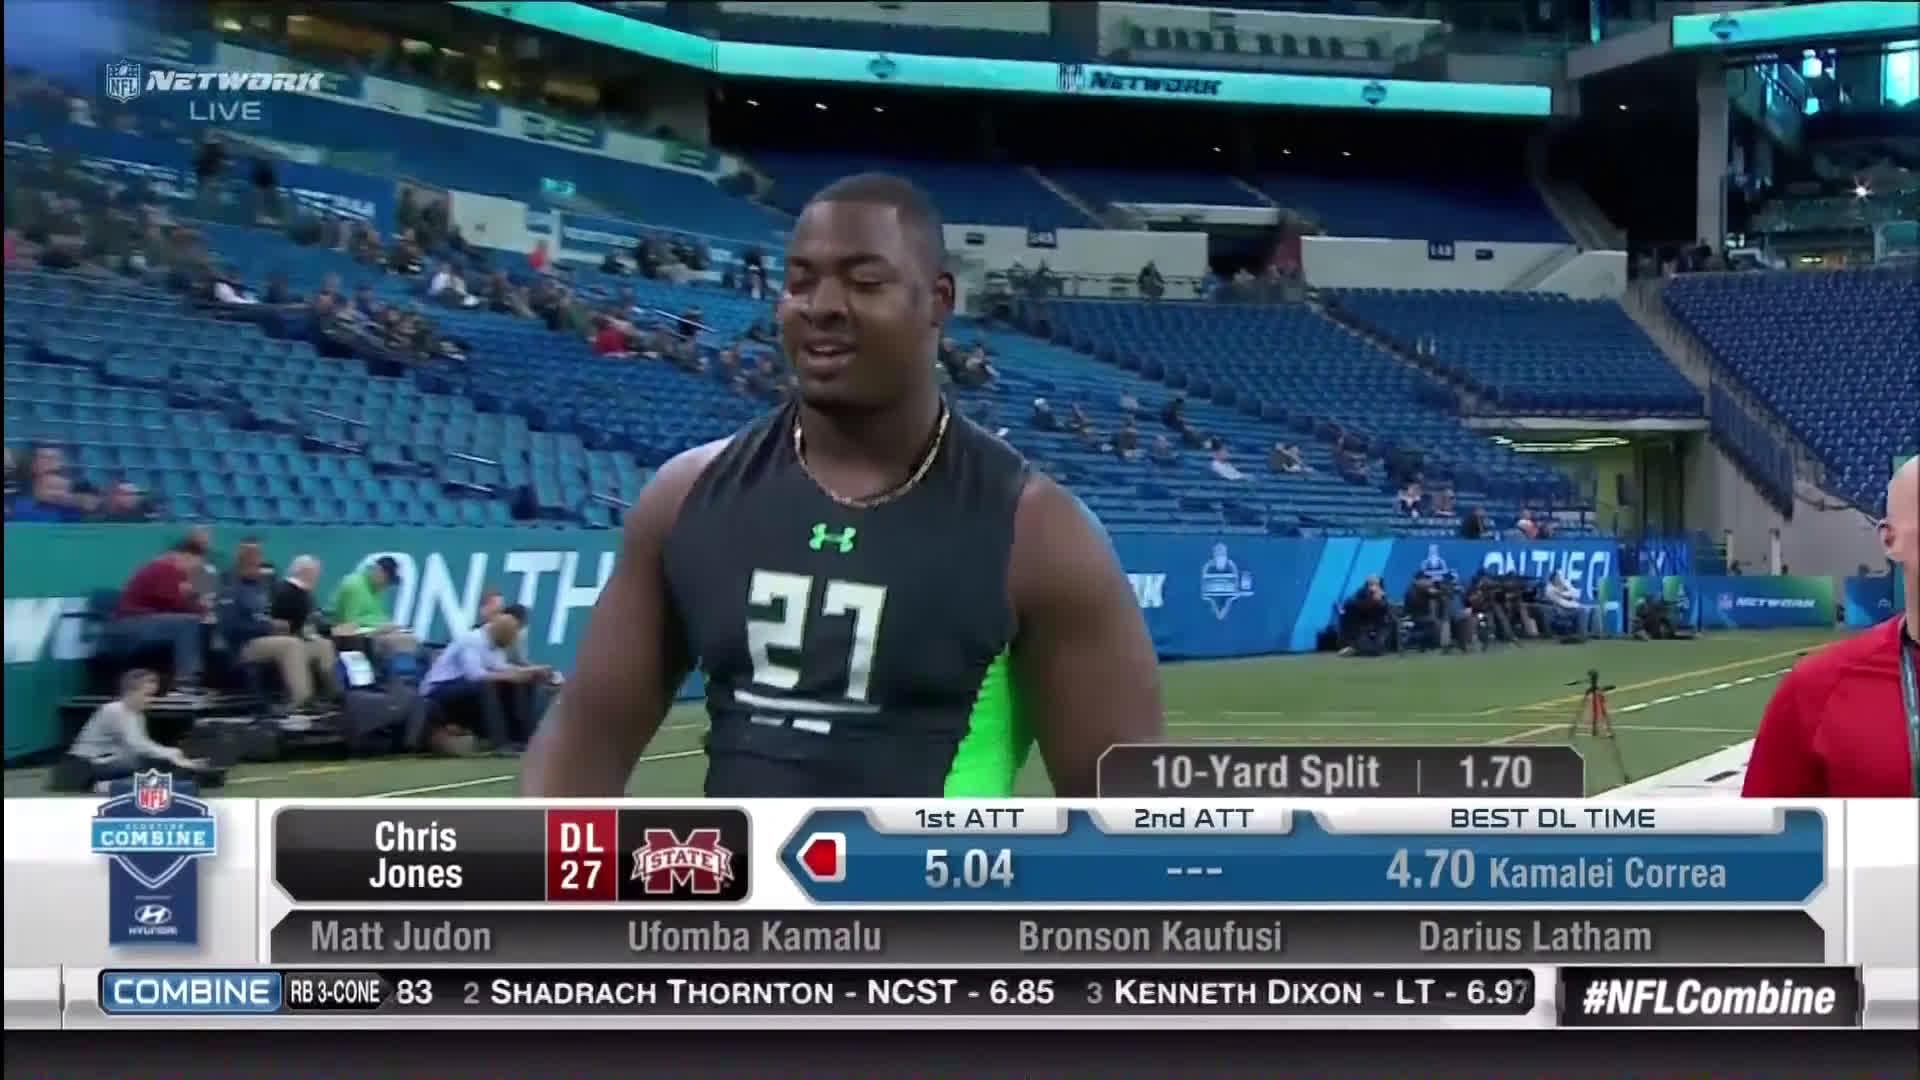 VIDEO  NFL Combine Had Its Inevitable Wardrobe Malfunction  NSFW ... 7a6bdd999